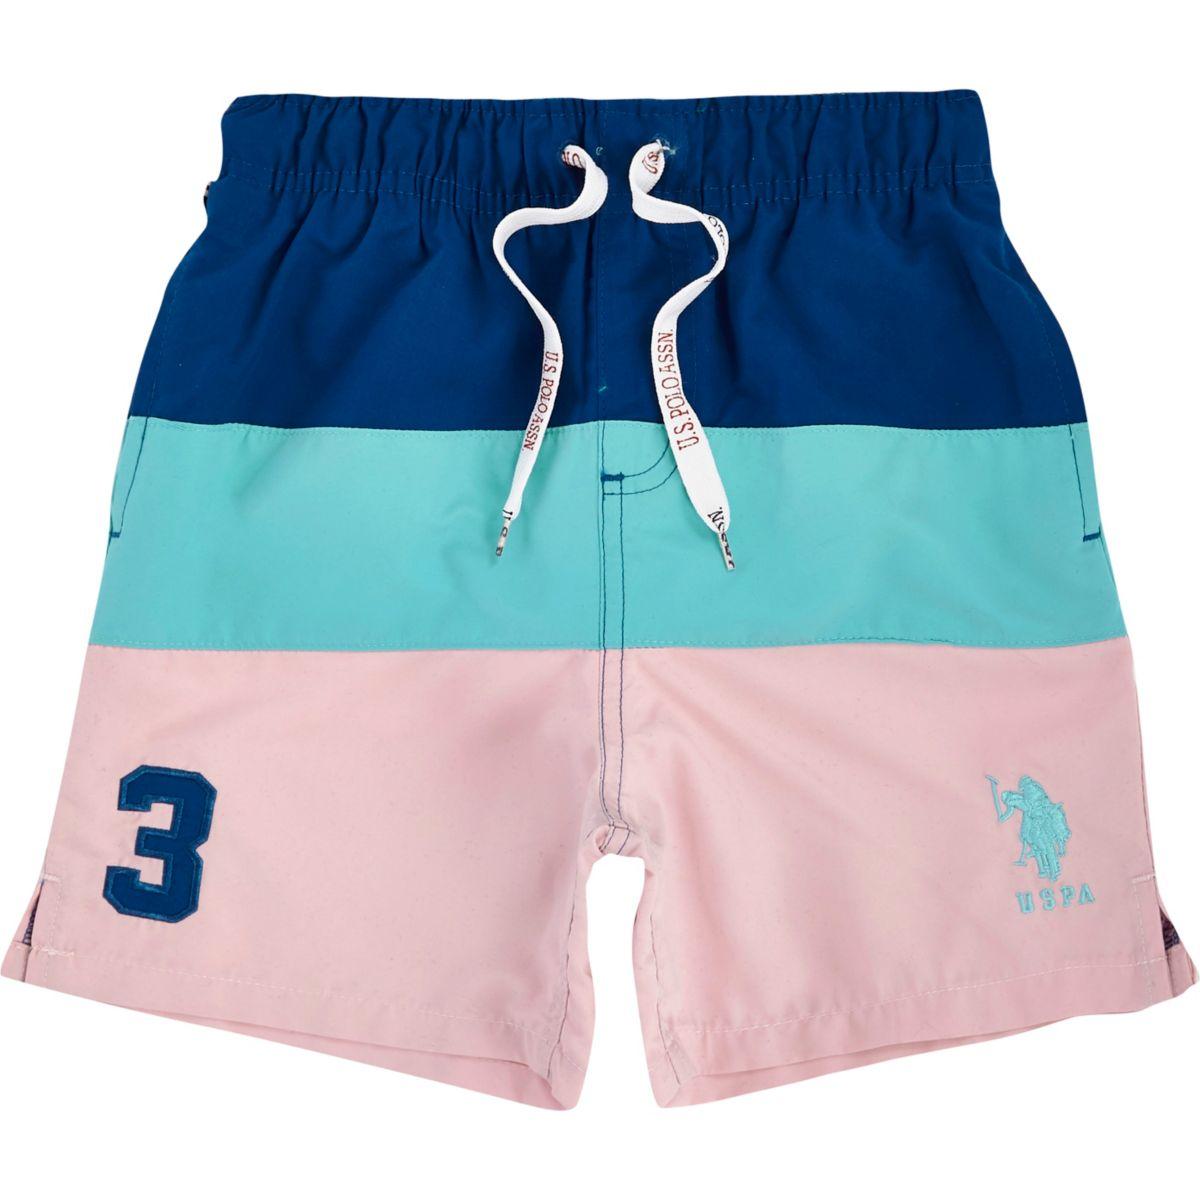 Boys pink U.S. Polo Assn. blocked swim shorts